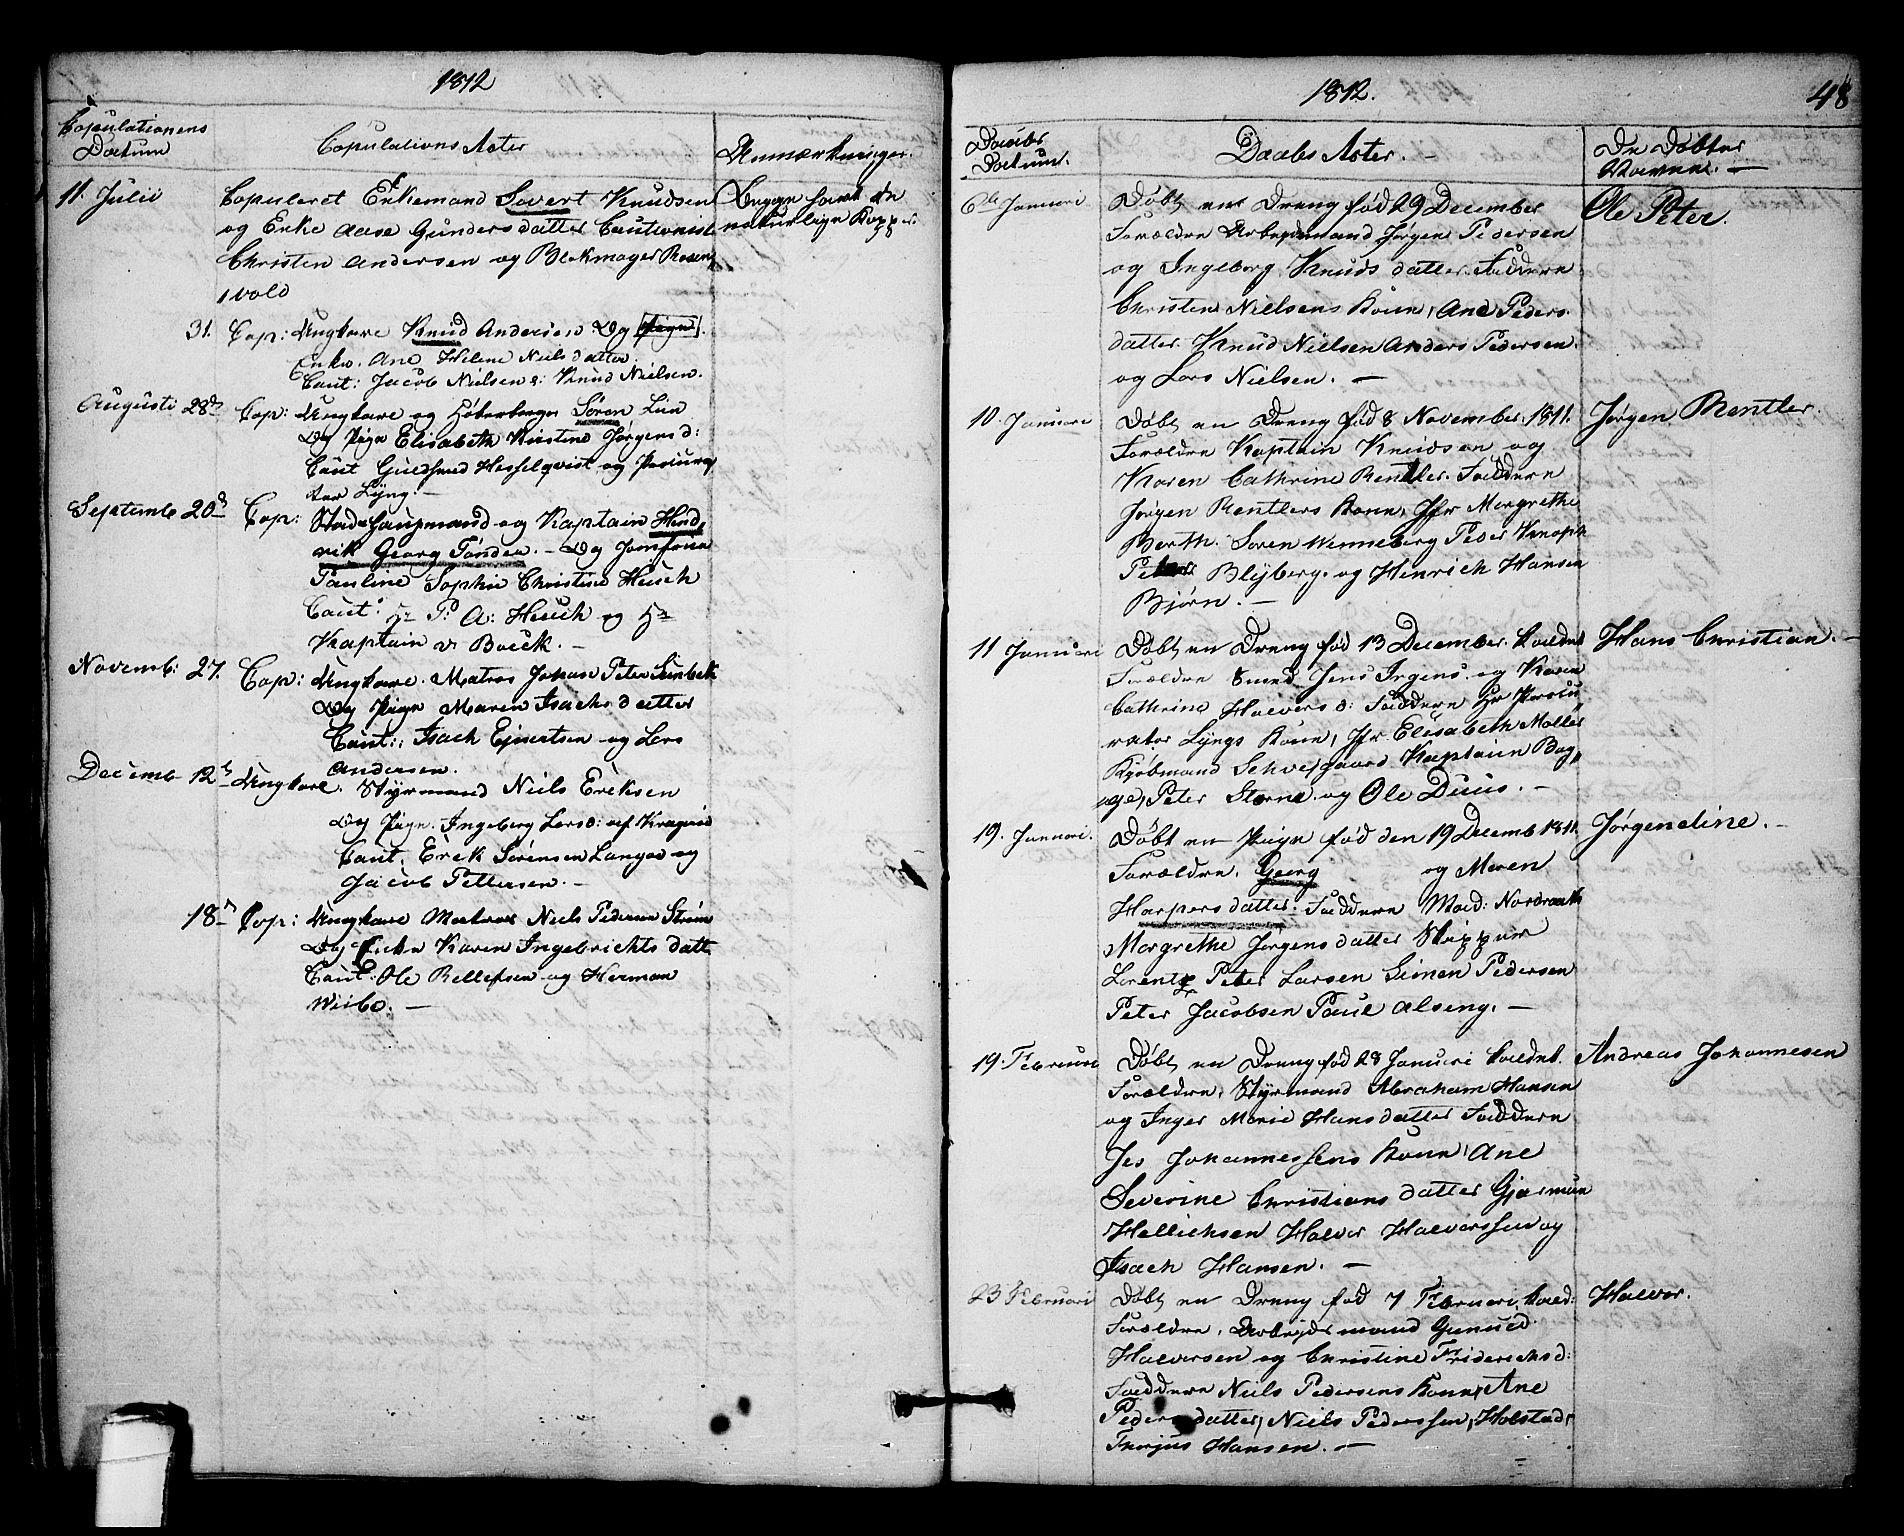 SAKO, Kragerø kirkebøker, F/Fa/L0003: Ministerialbok nr. 3, 1802-1813, s. 48